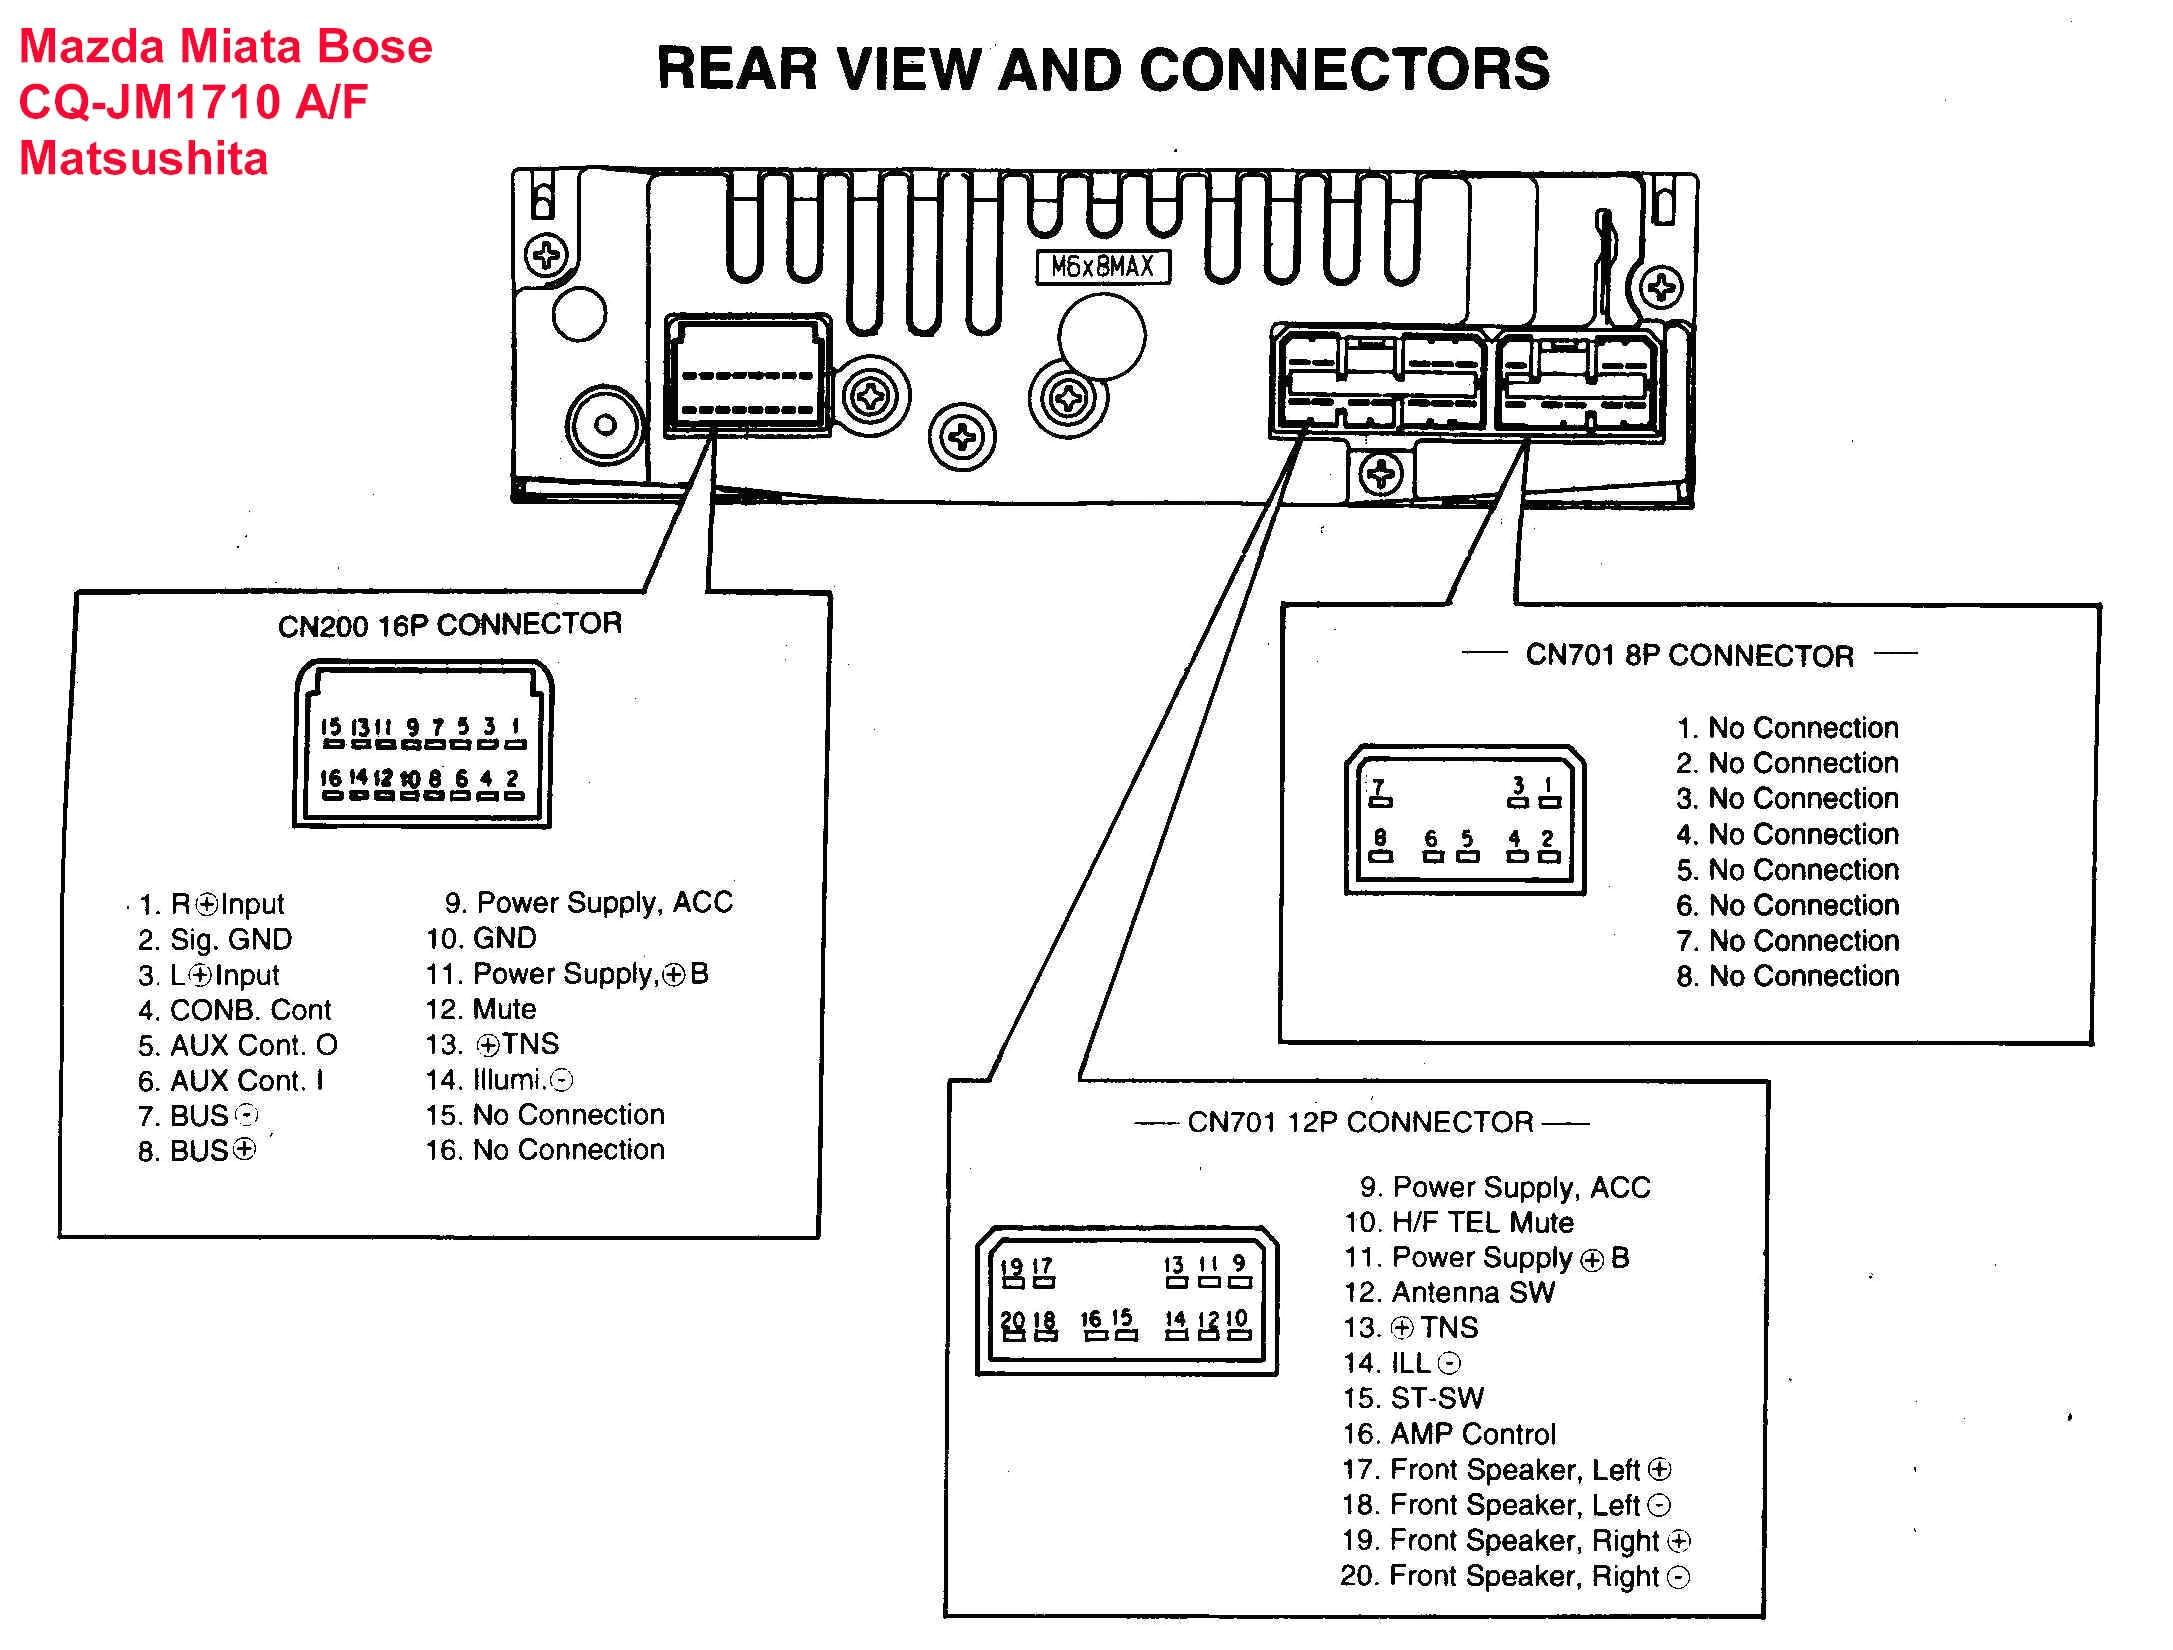 2000 nissan maxima radio wiring diagram new wiring diagram besides wiring diagram for car audio system wiring of 2000 nissan maxima radio wiring diagram jpg